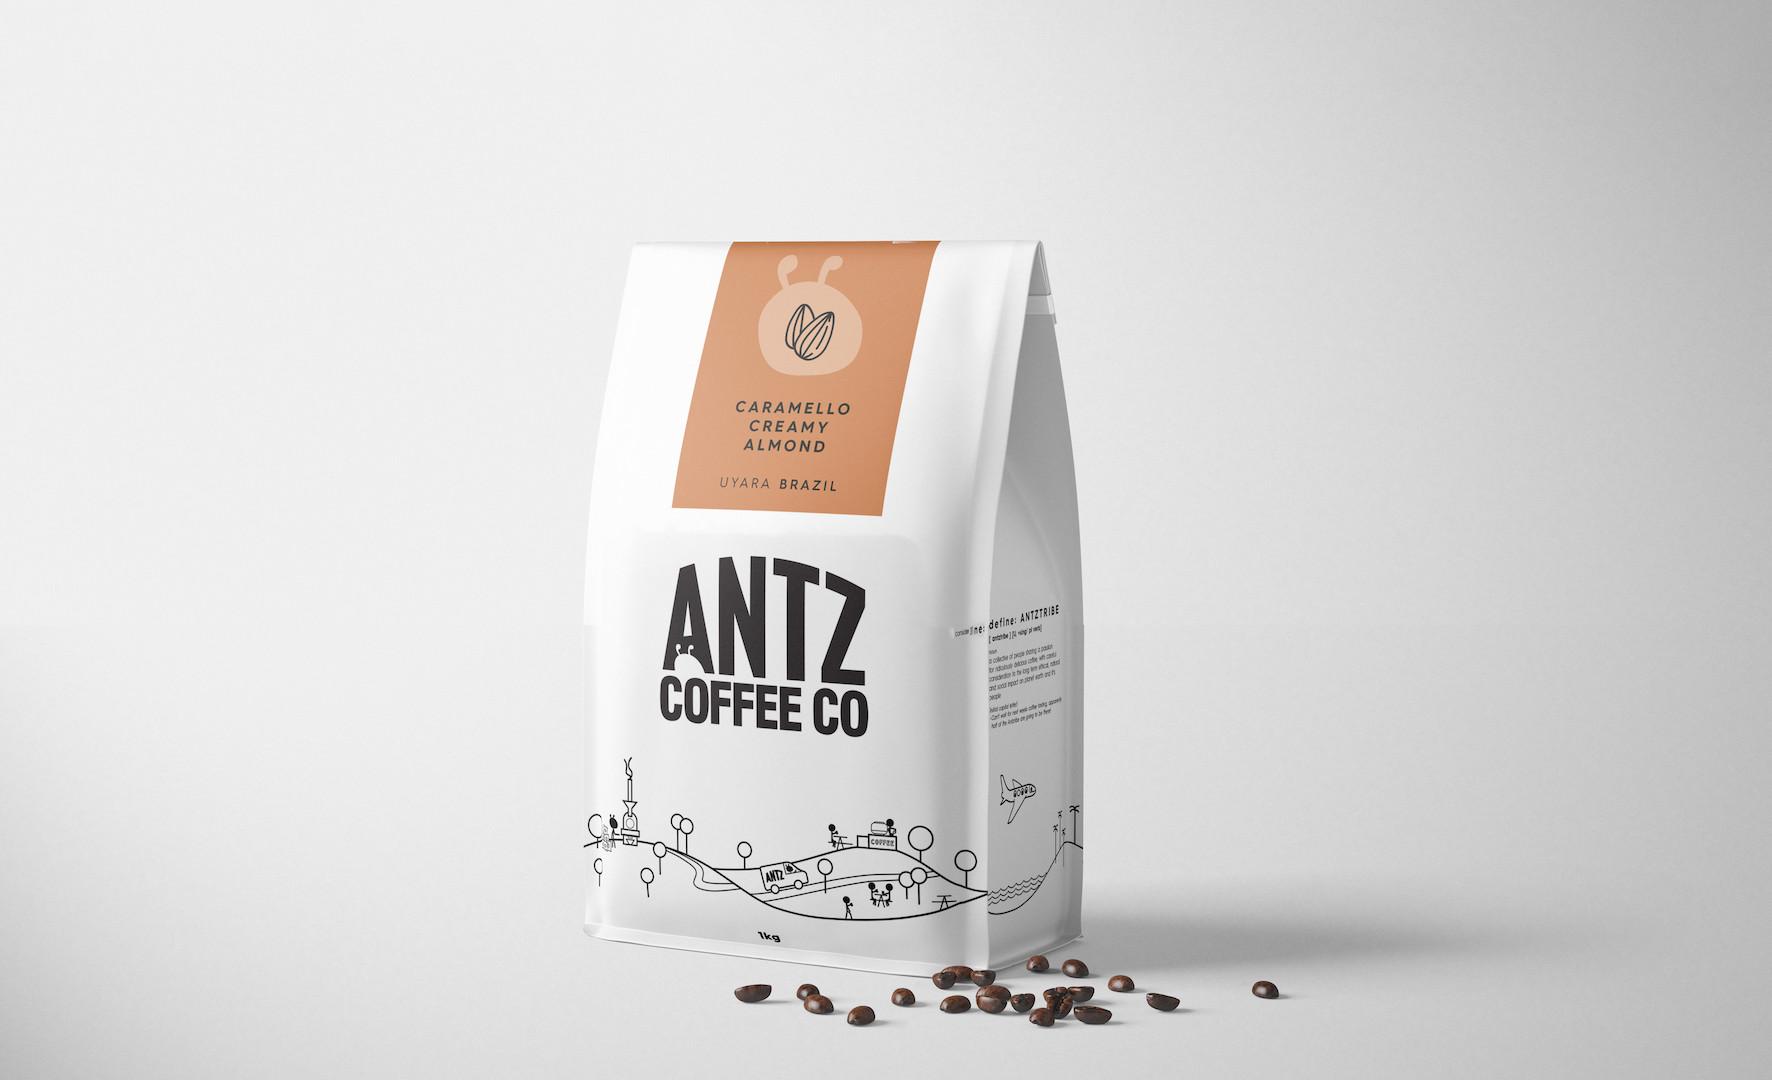 Antz_CoffeeBagz_1kg_RightSide.jpg